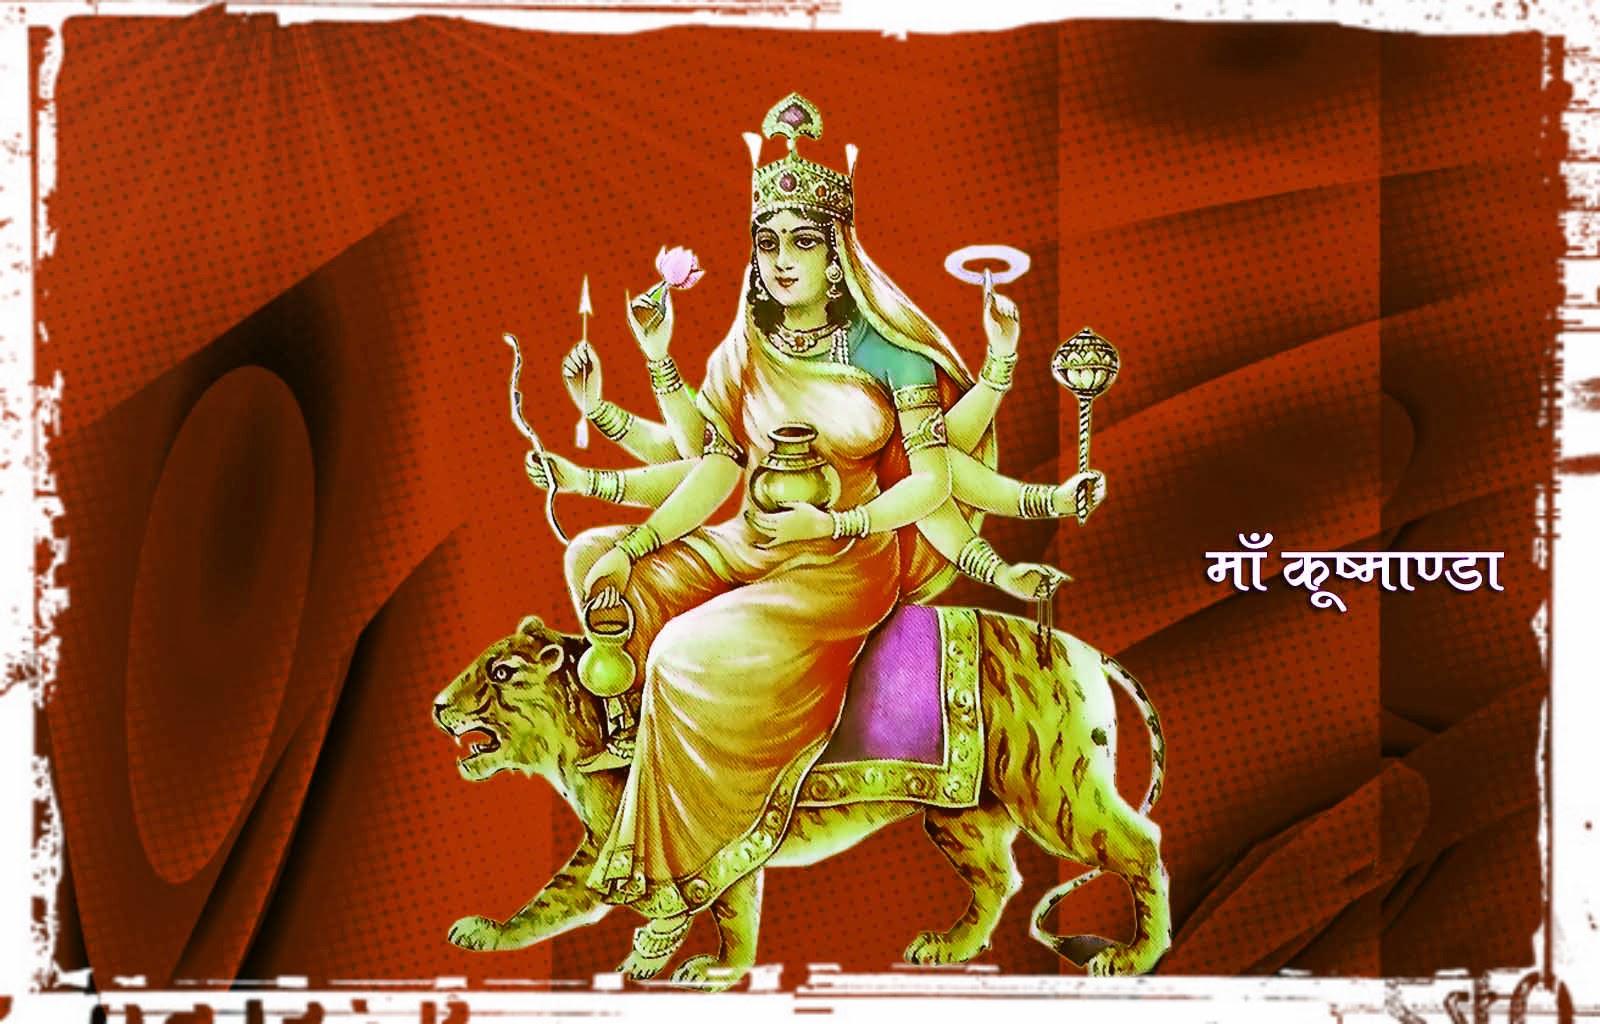 Jharkhand Girl Wallpaper Maa Kushmanda Hd Images Wallpaper Photos Pictures